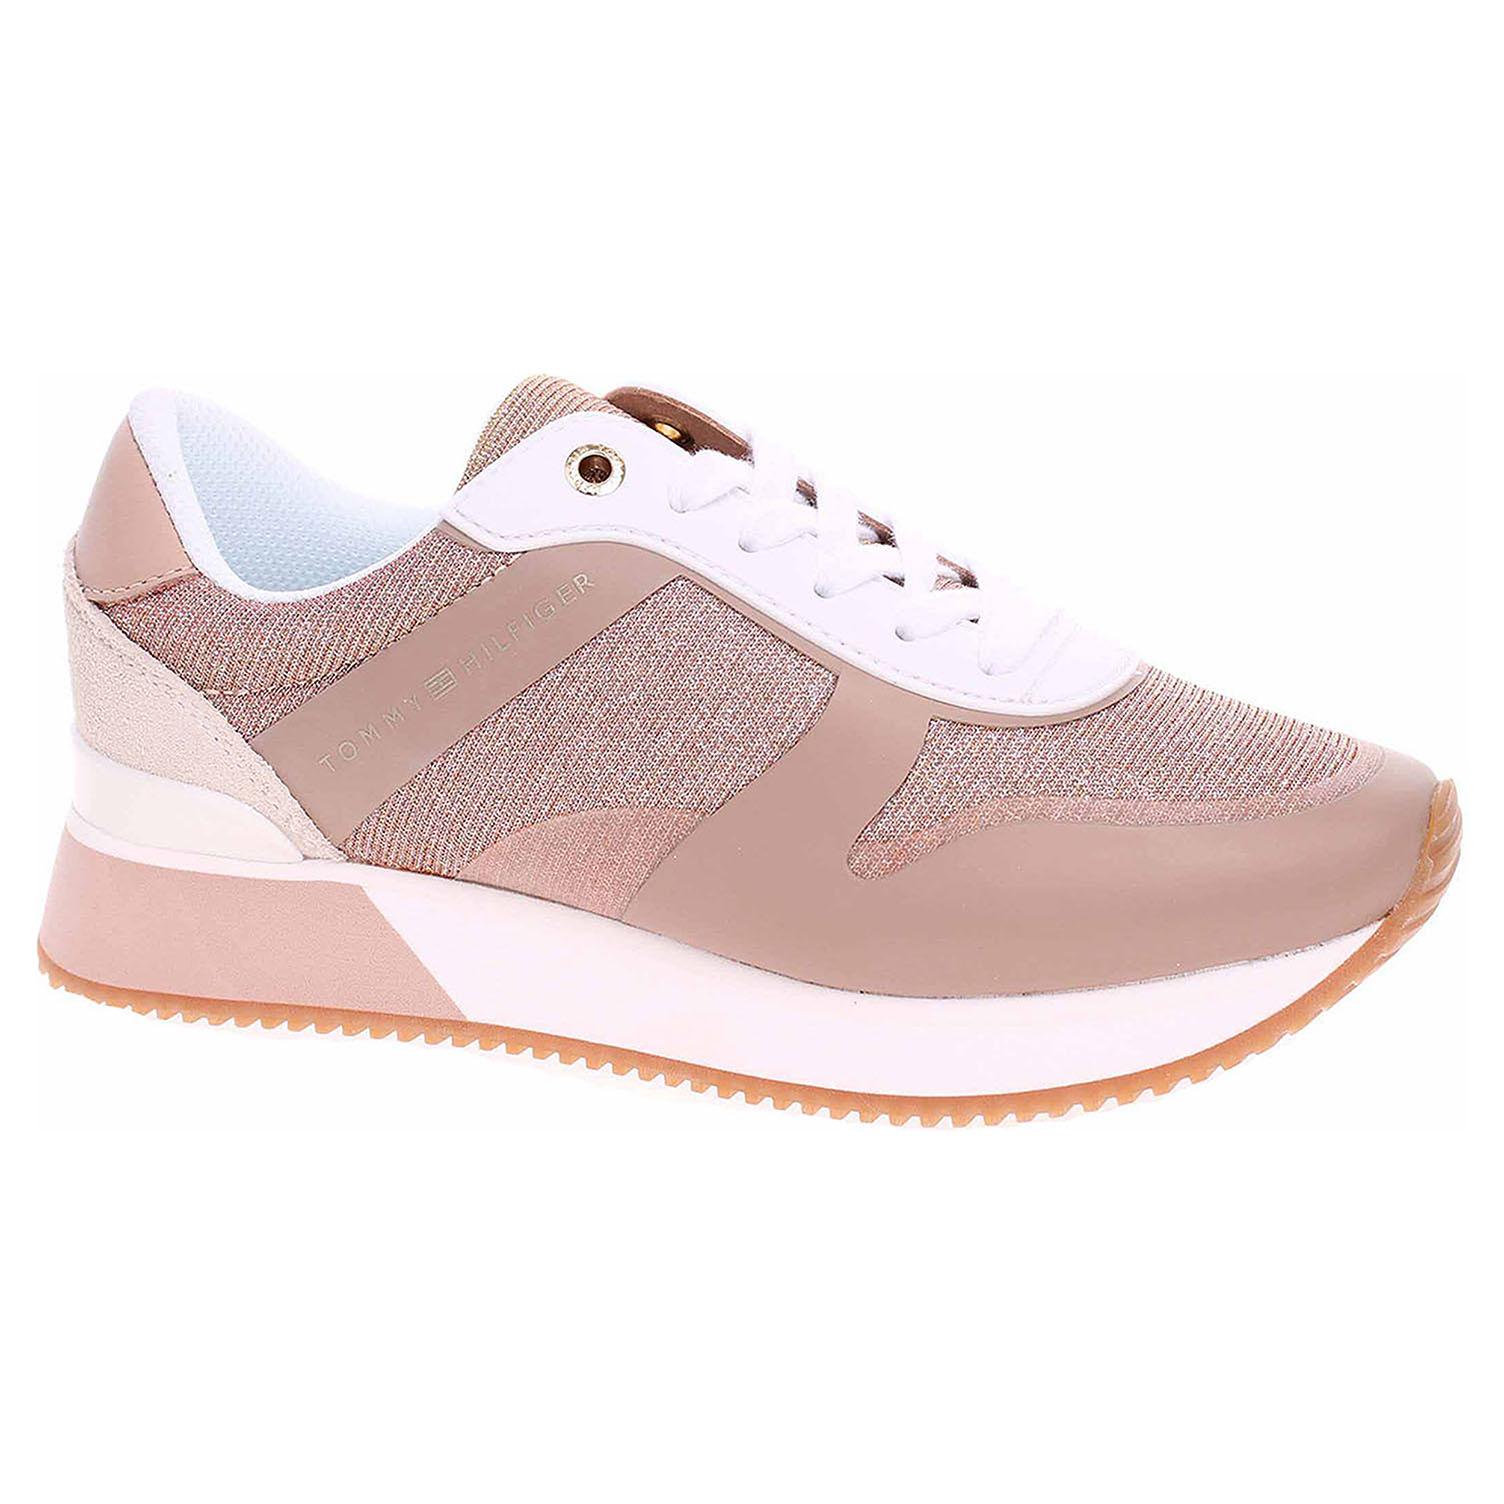 b22a457f18 detail Dámská obuv Tommy Hilfiger FW0FW03772 monrovia